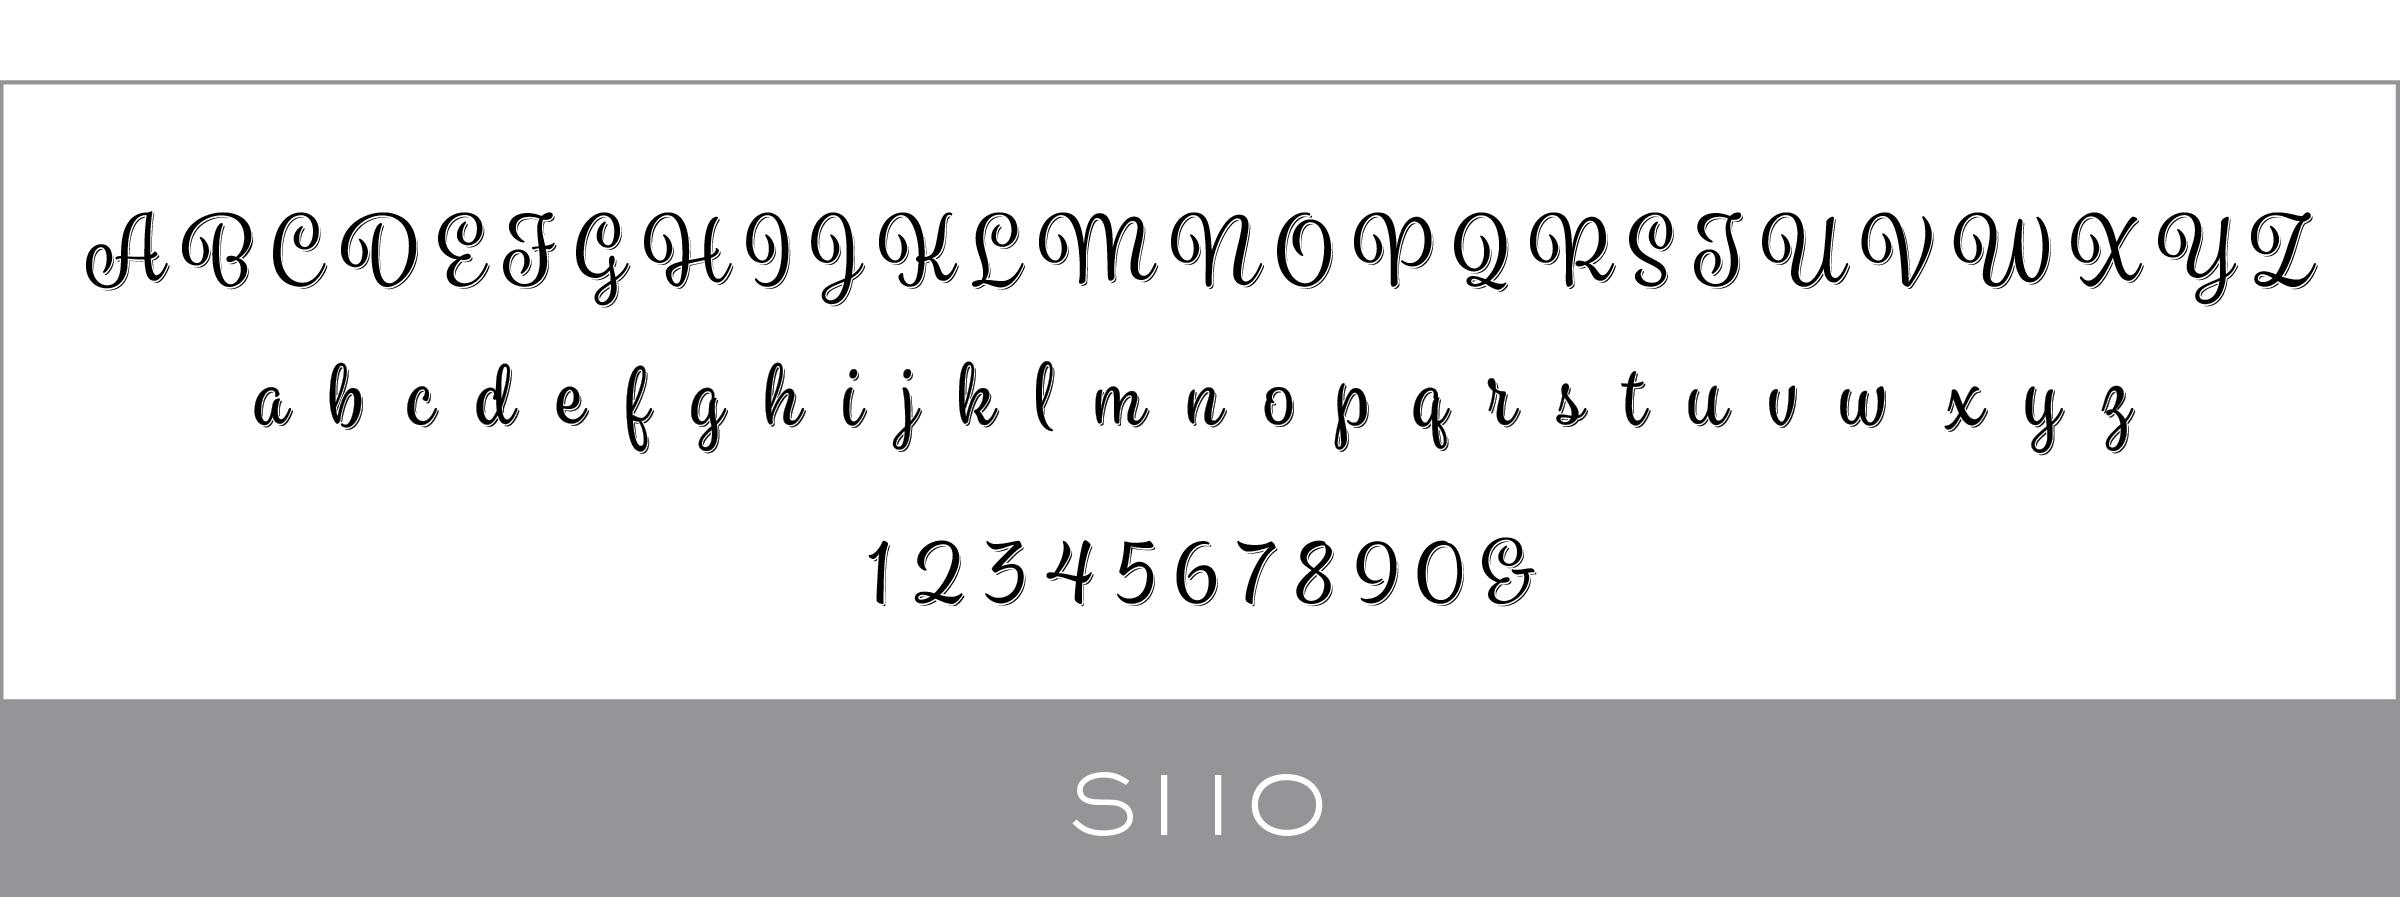 S110_Haute_Papier_Font.jpg